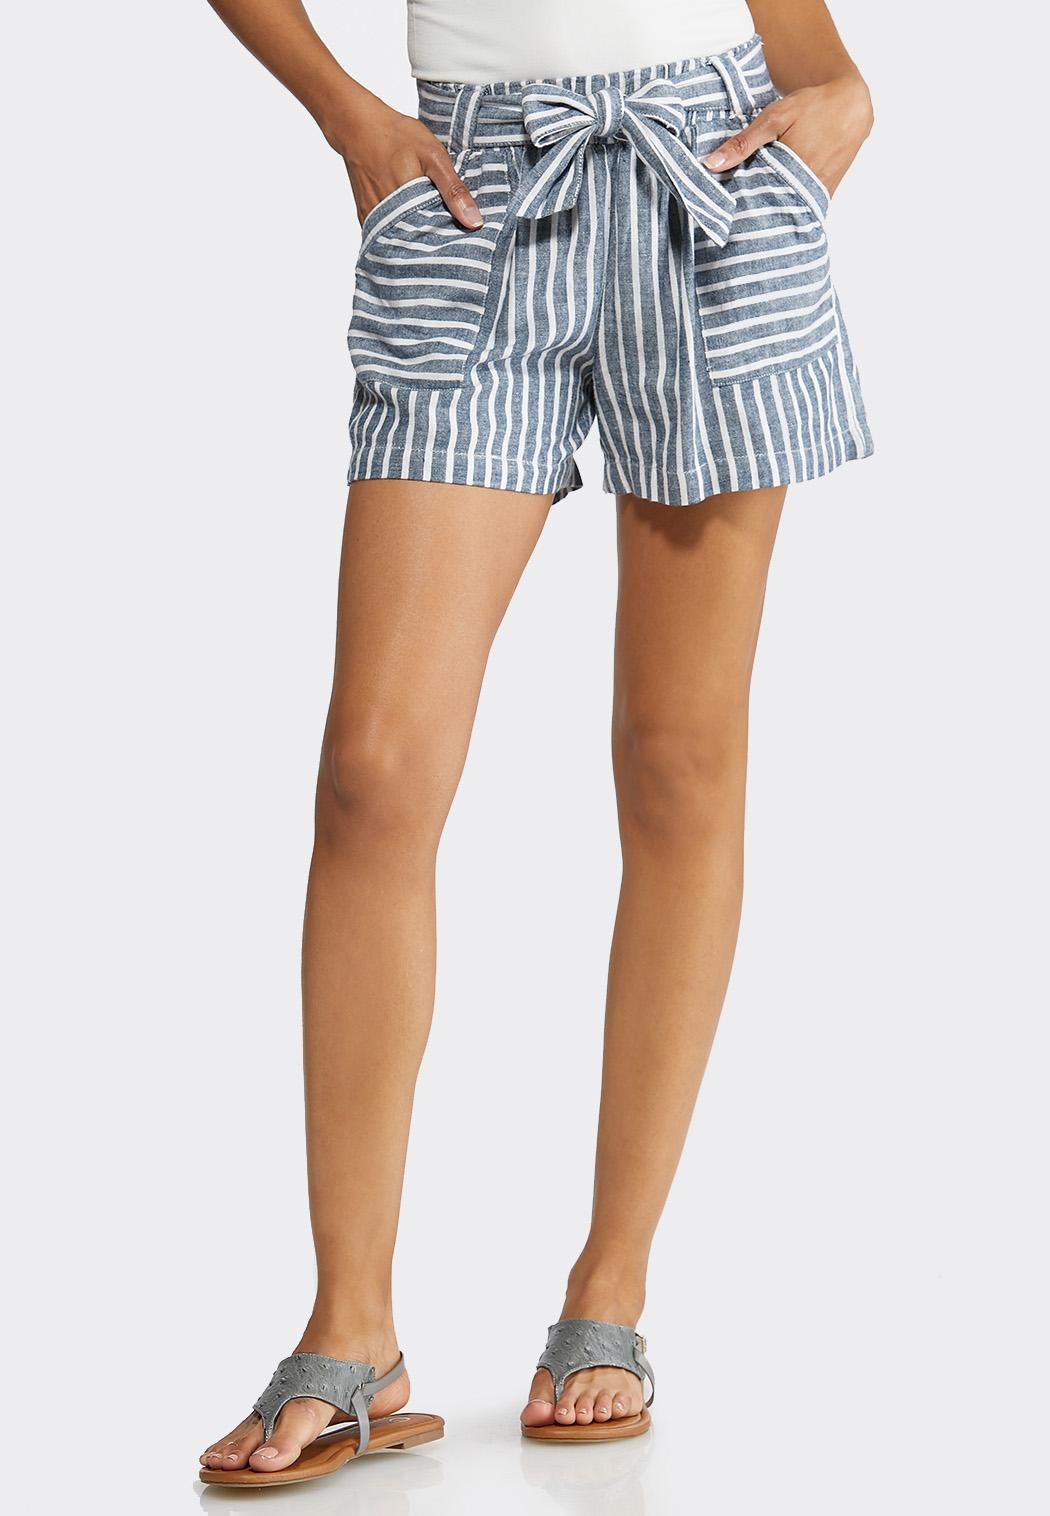 f75d7619f2d Nautical Stripe Linen Shorts alternate view · Nautical Stripe Linen Shorts